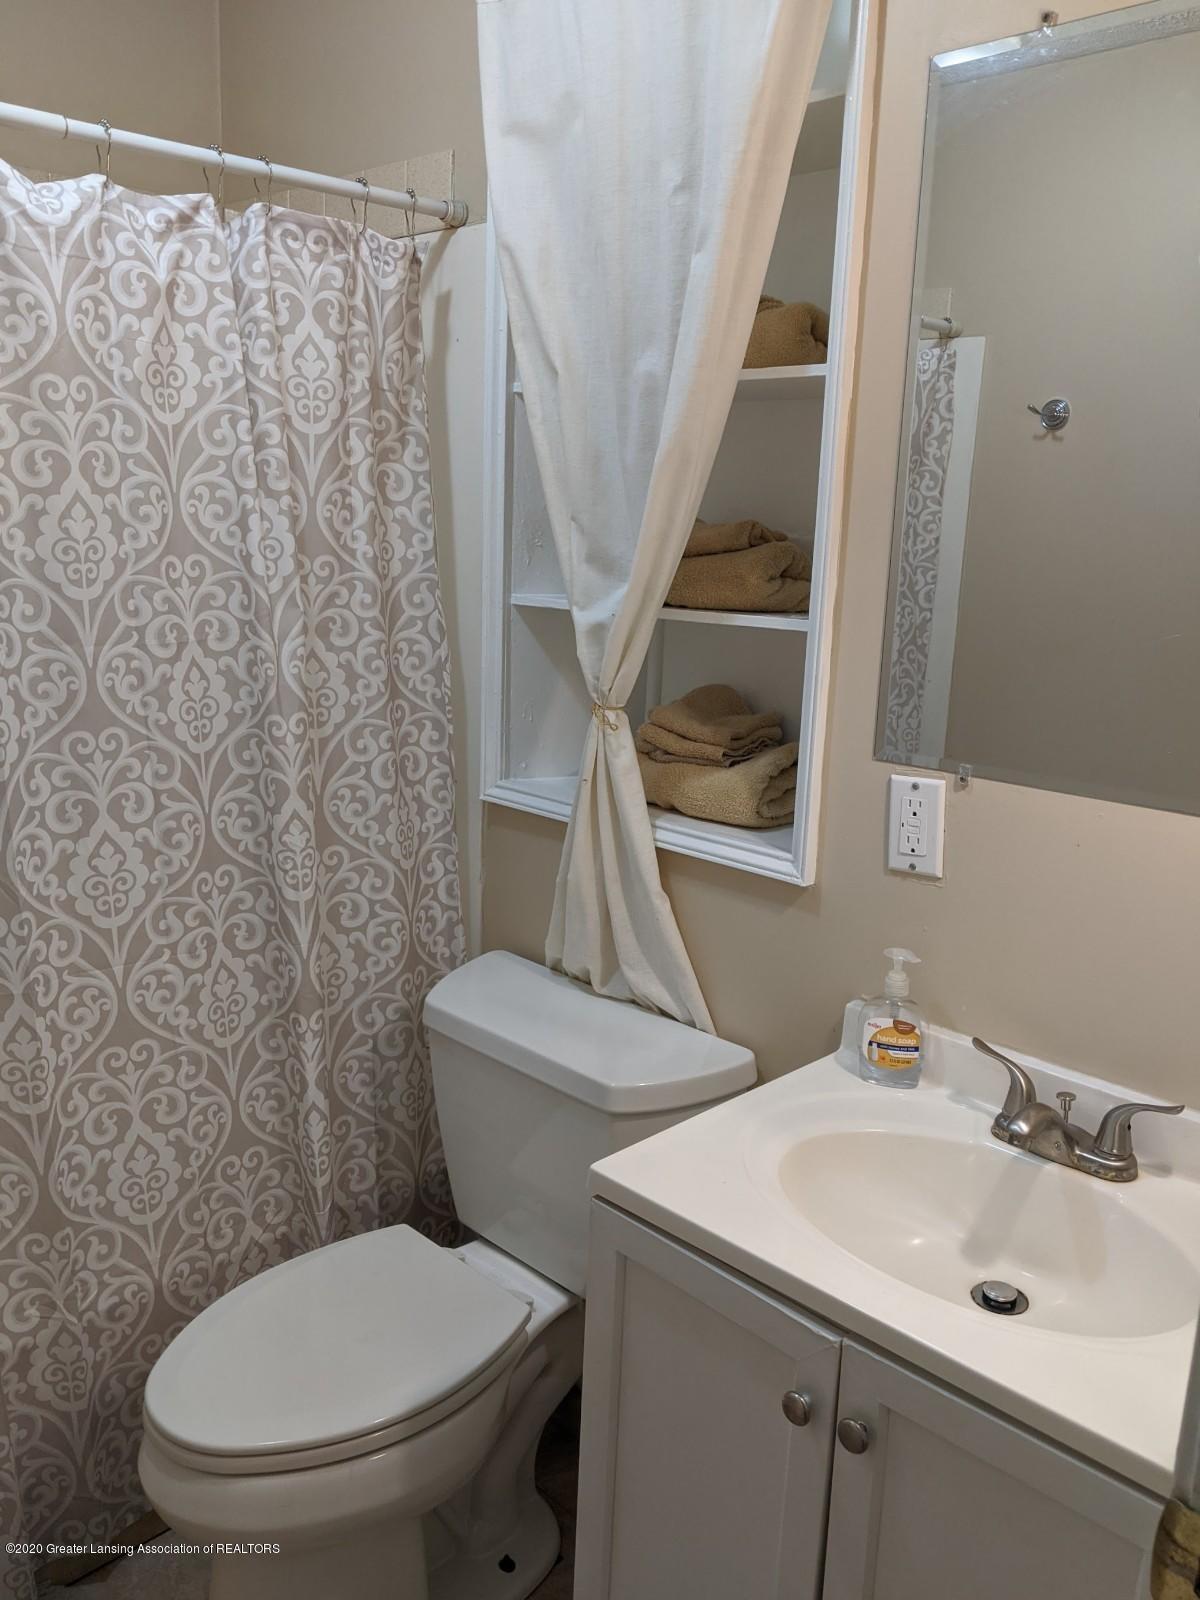 5030 Tenny St - Bathroom - 17